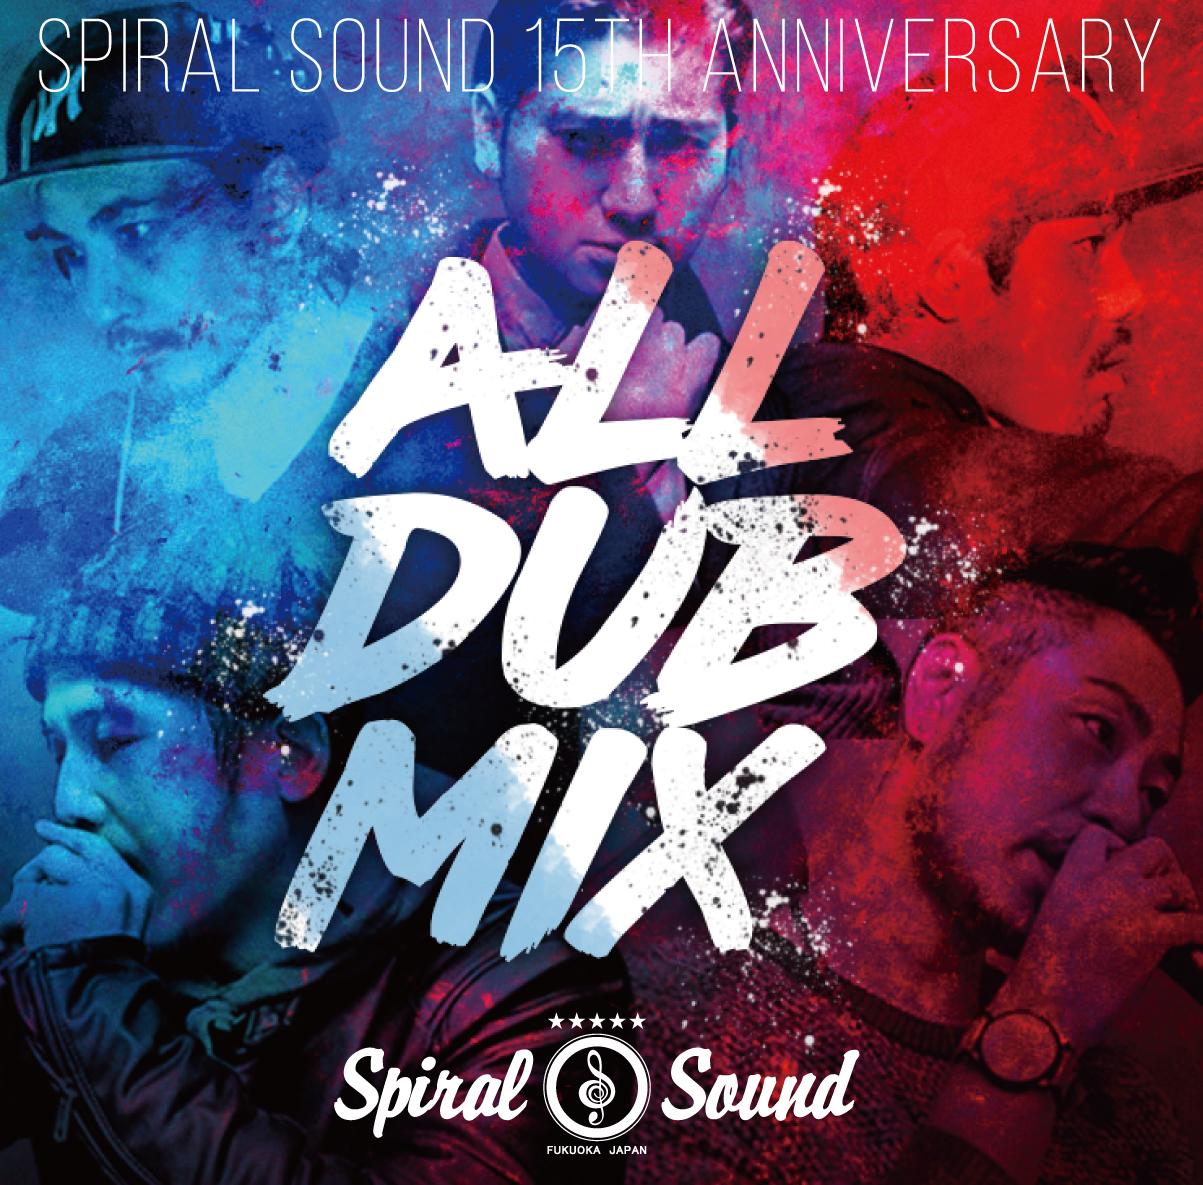 SPIRAL SOUND ALL DUB MIX